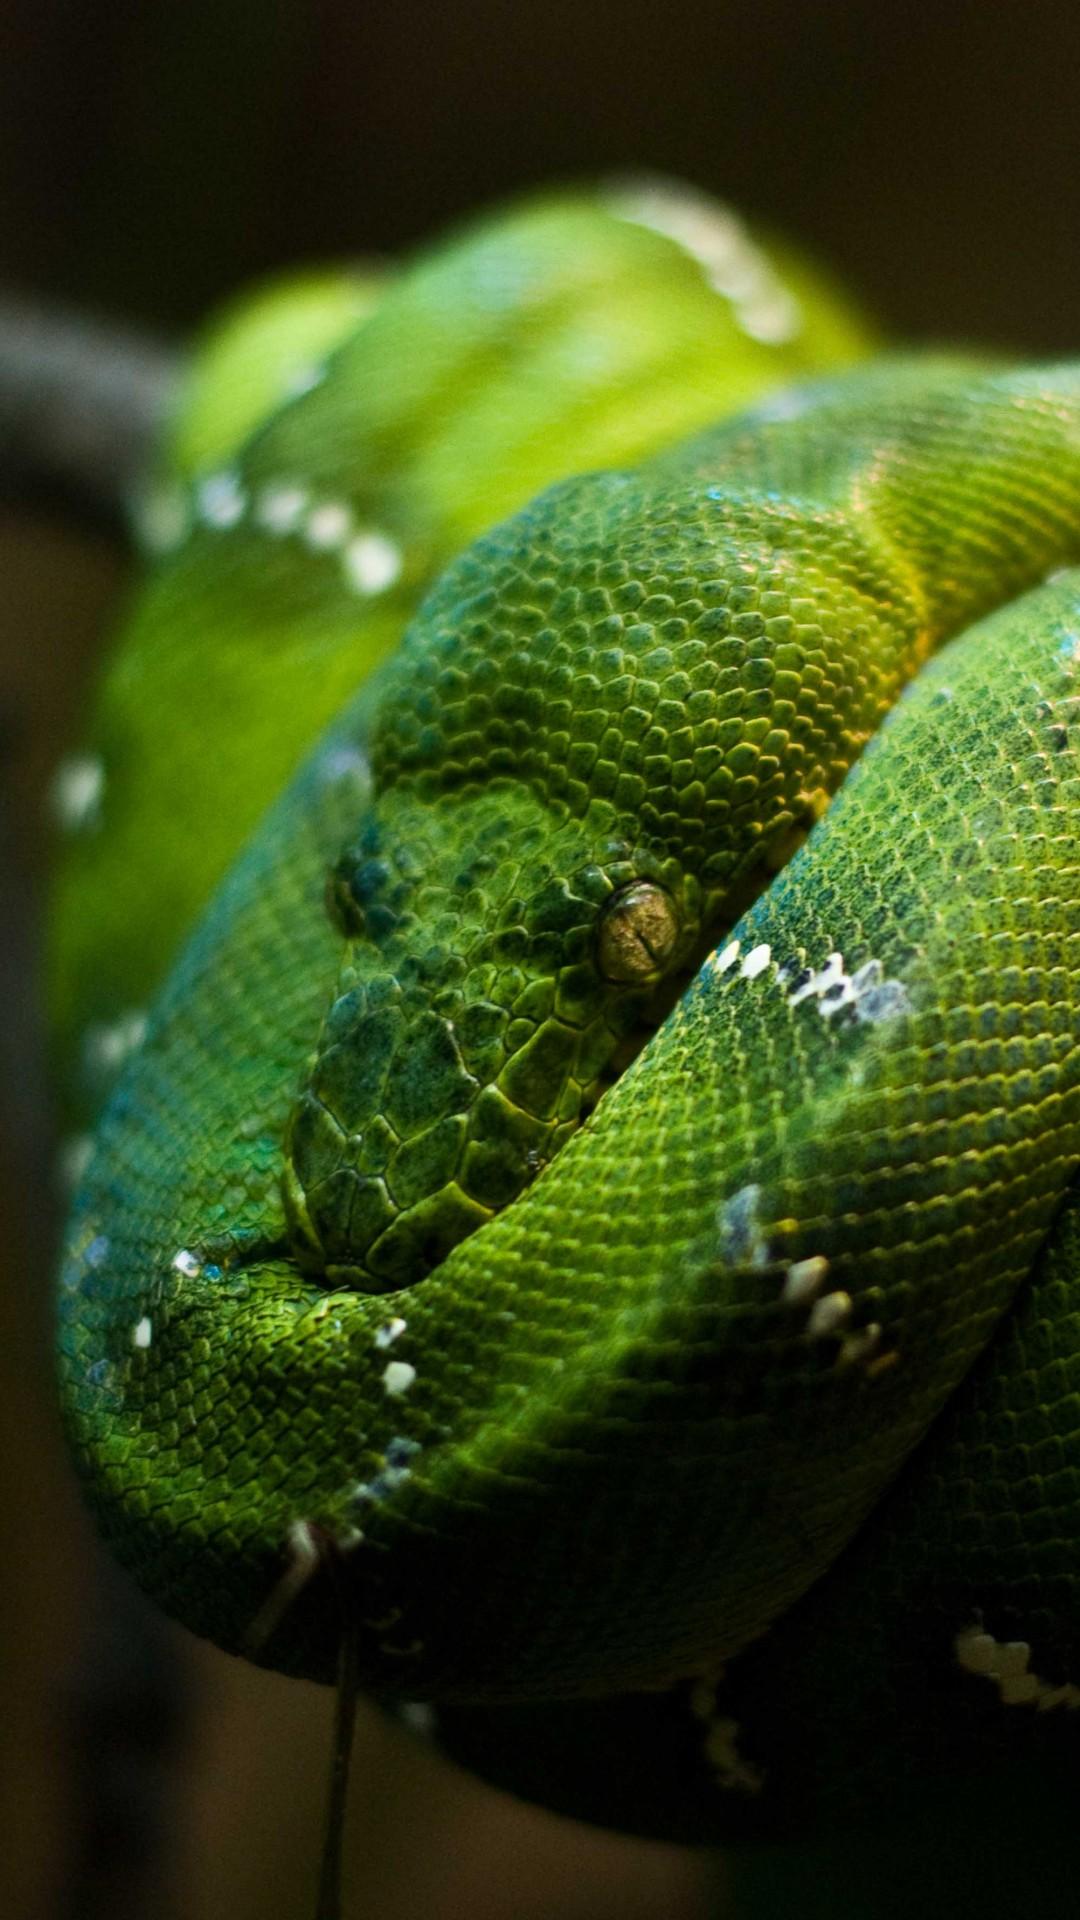 Wallpaper Python Singapore Zoo Emerald Green Snake